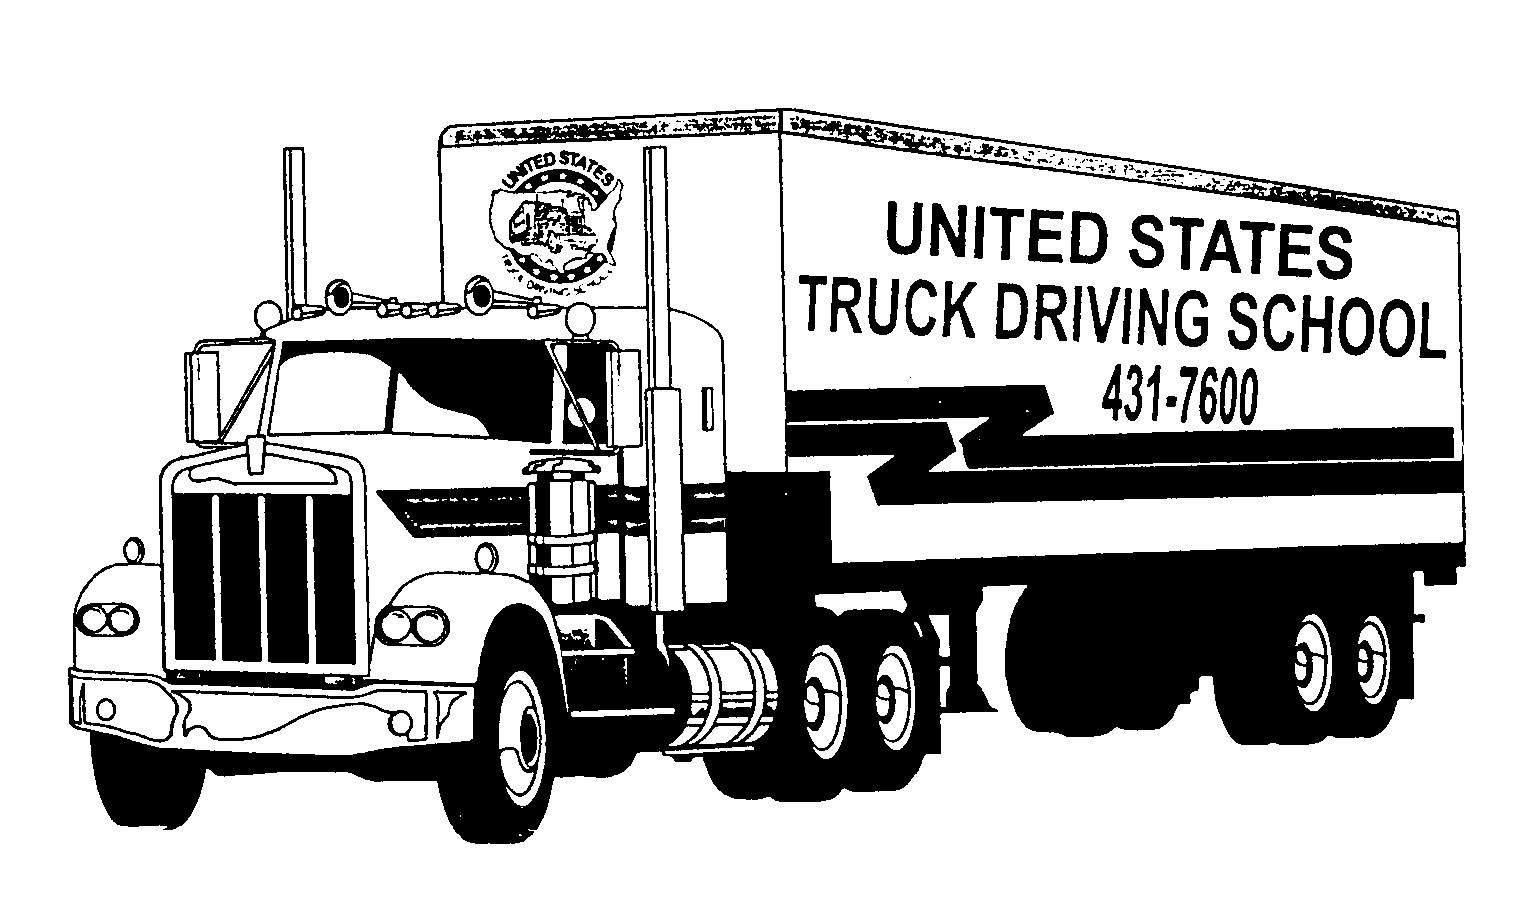 United States Truck Driving School Inc